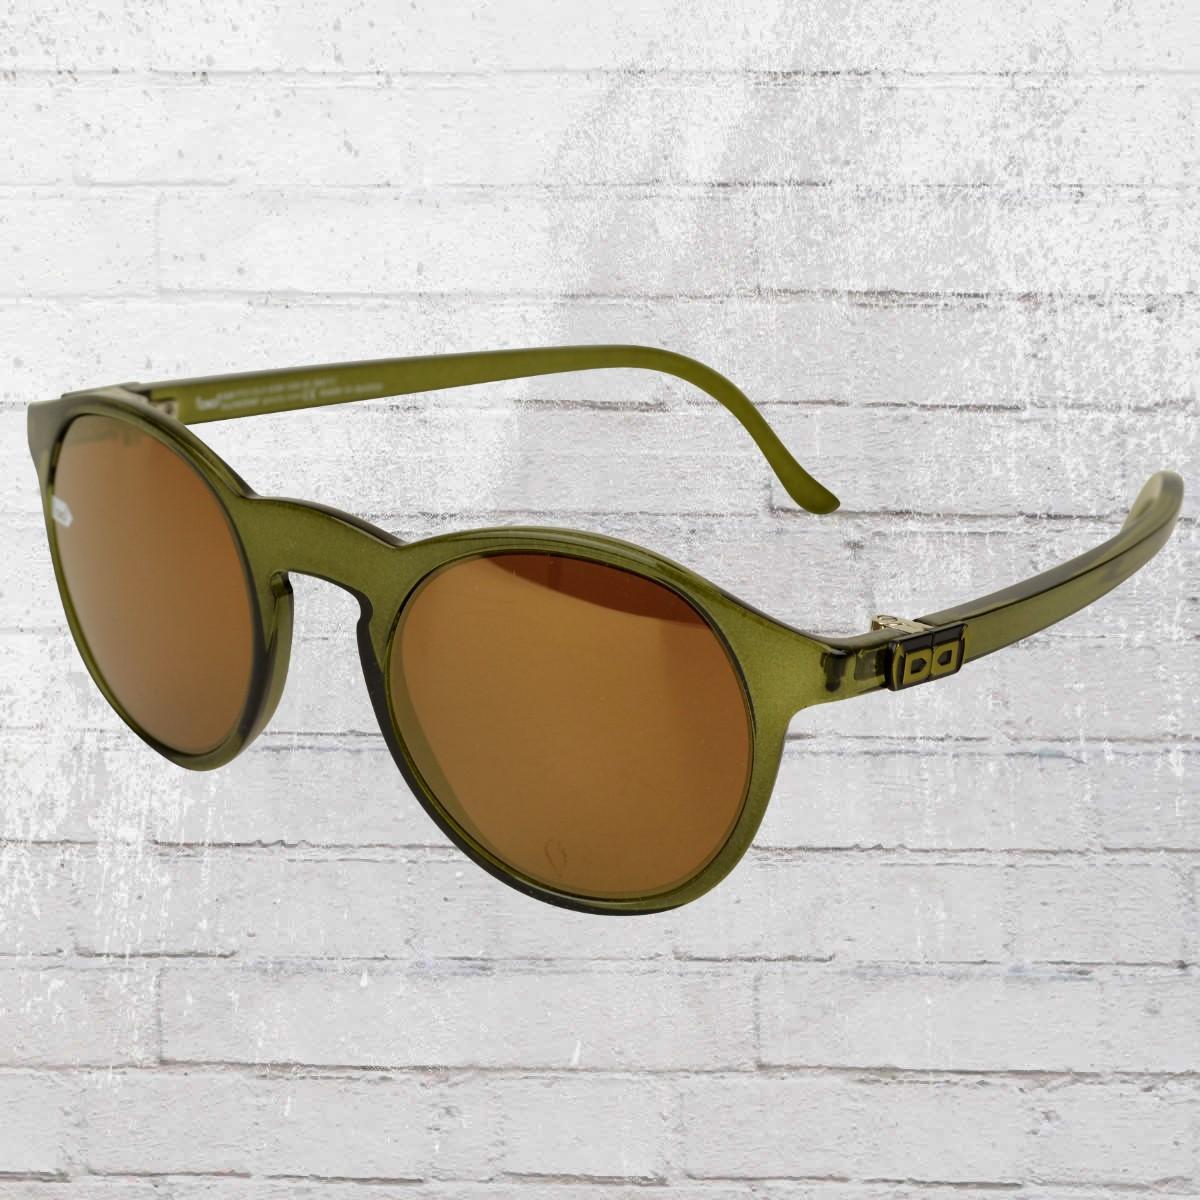 Jetzt bestellen | Gloryfy Sonnenbrille Unbreakable Gi8 Panto oliv ...